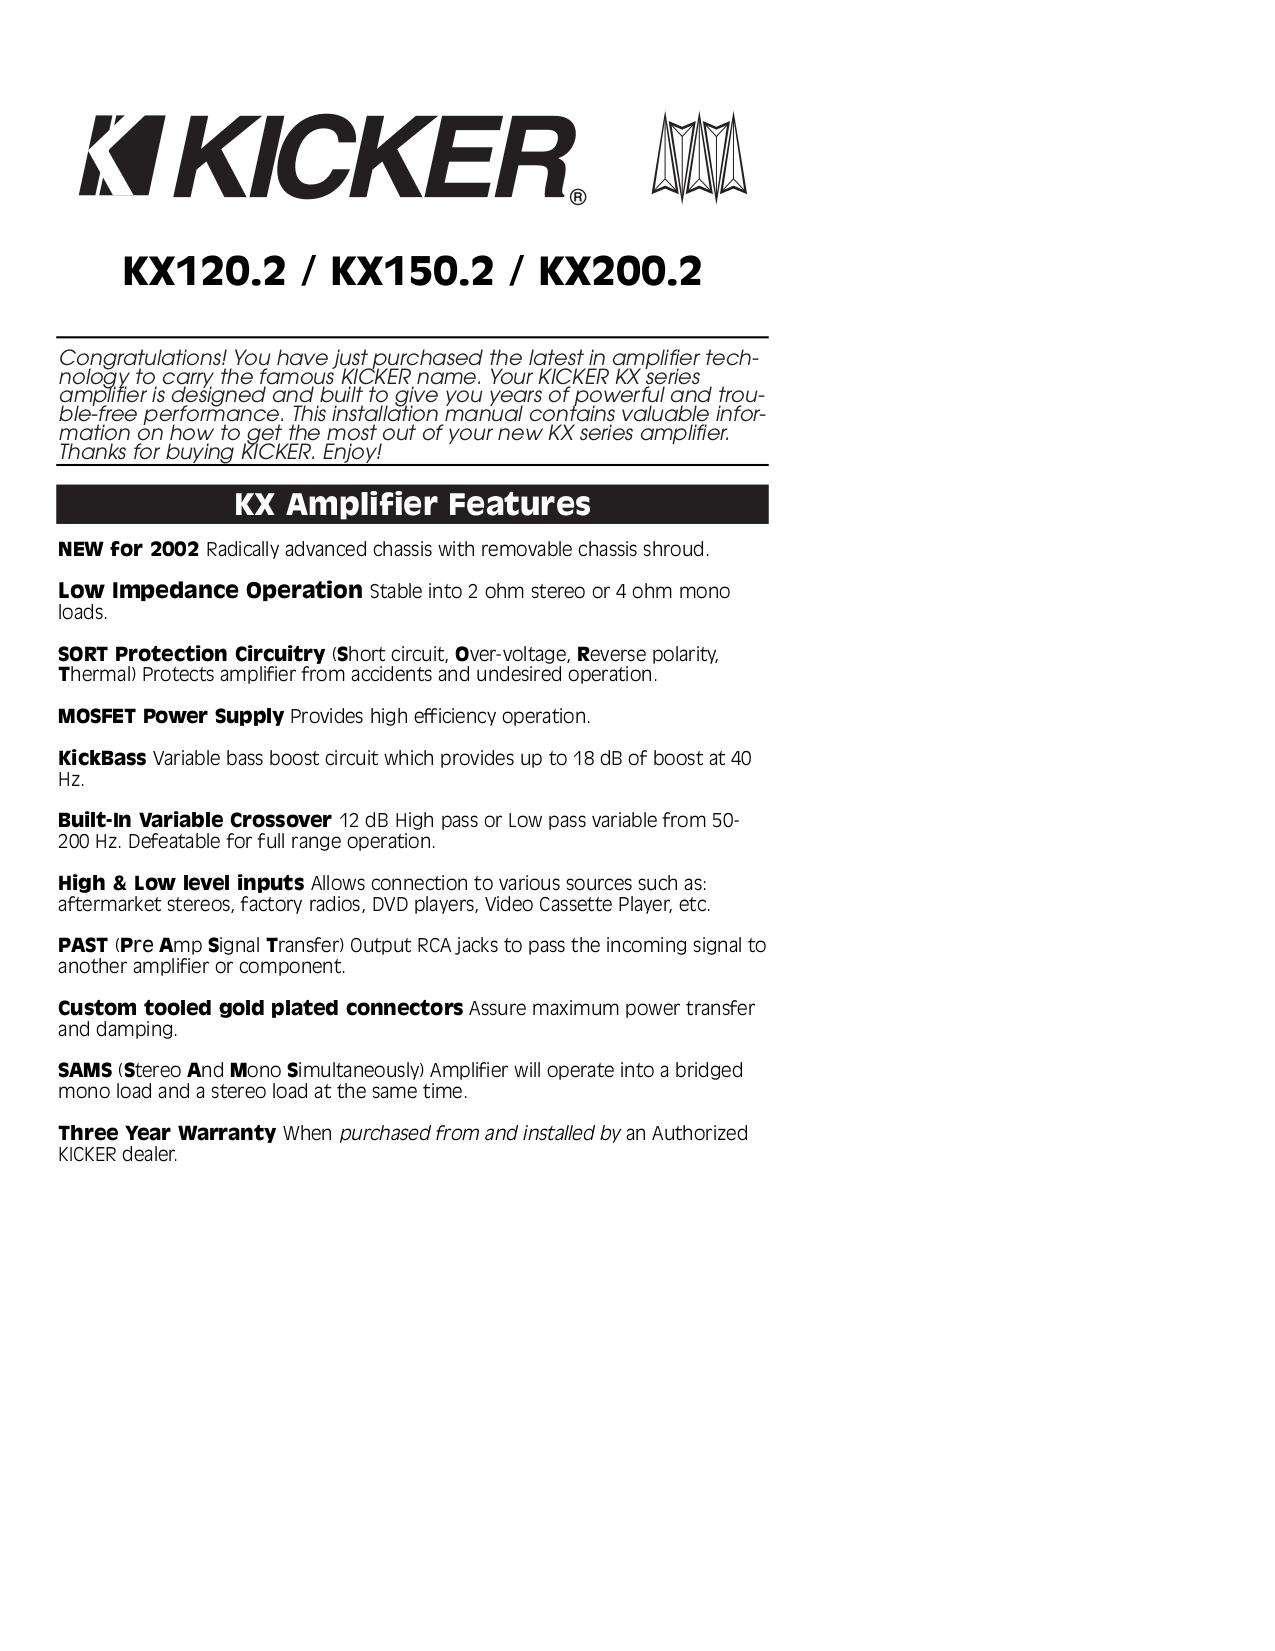 Best Image of Diagram Kicker L5 Manual - Millions Diagram ... on kicker amp wiring, kicker l7 12 box, subwoofer wiring,